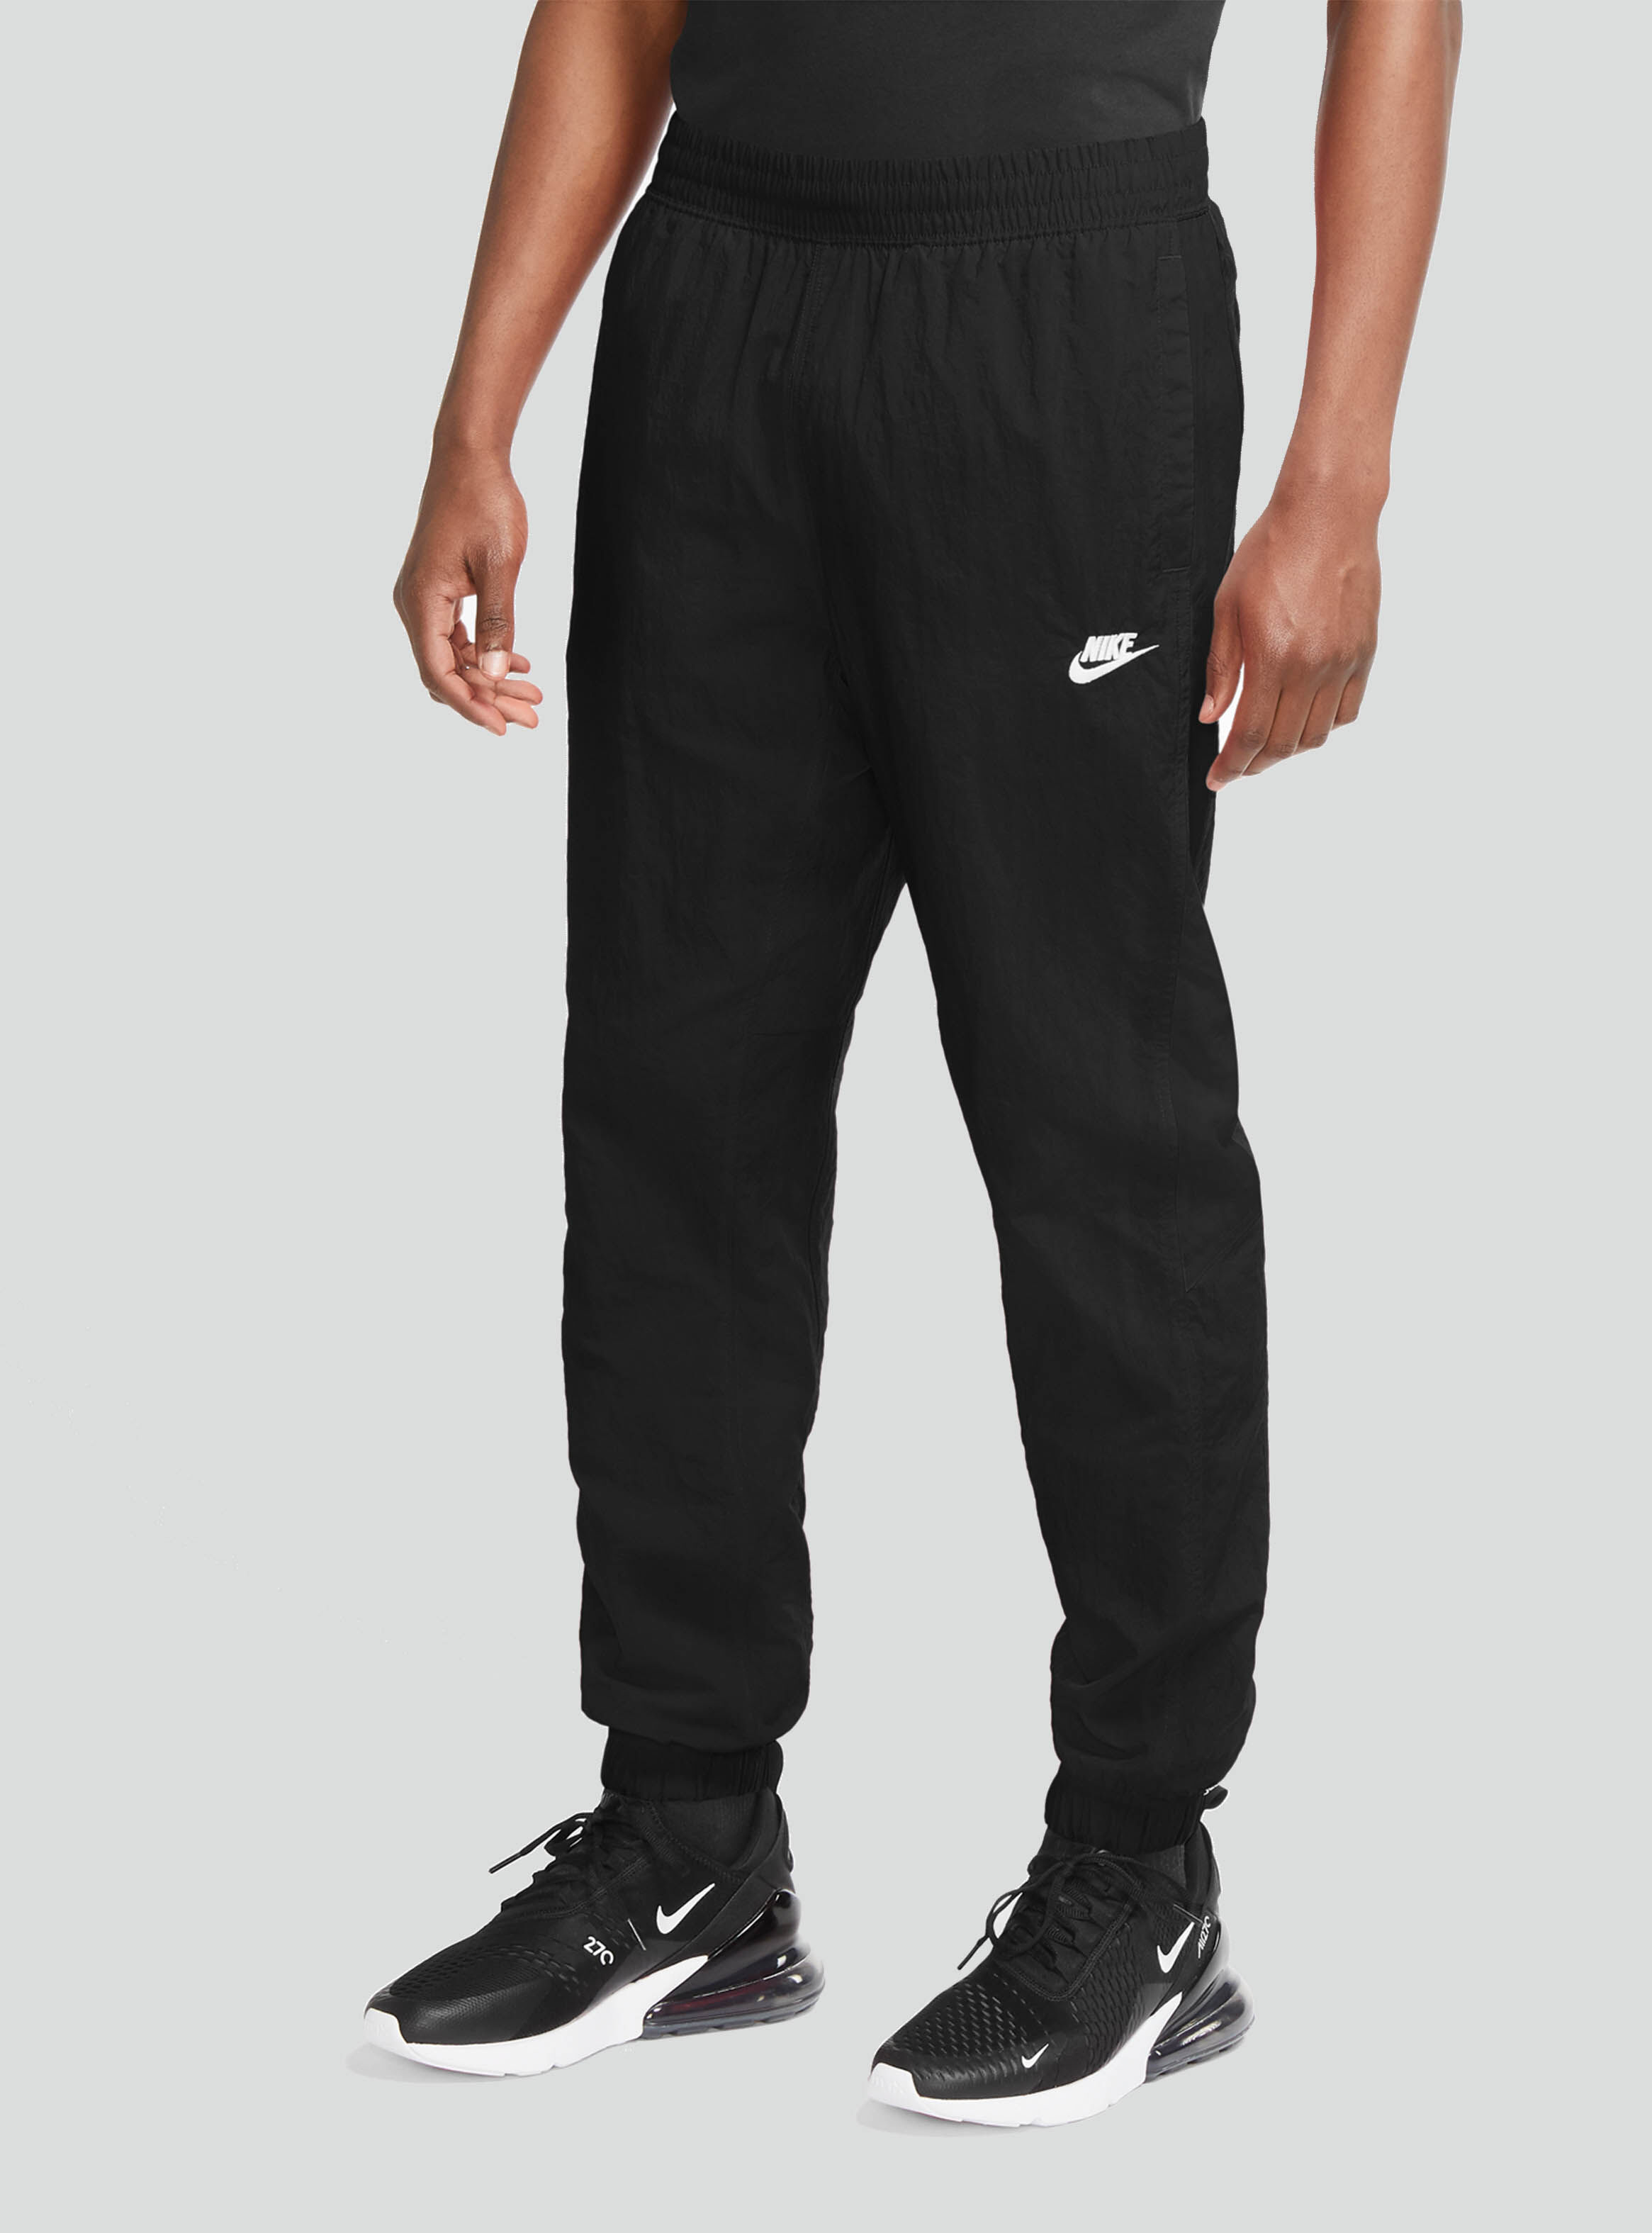 Pantalón Nike Sportswear Hombre